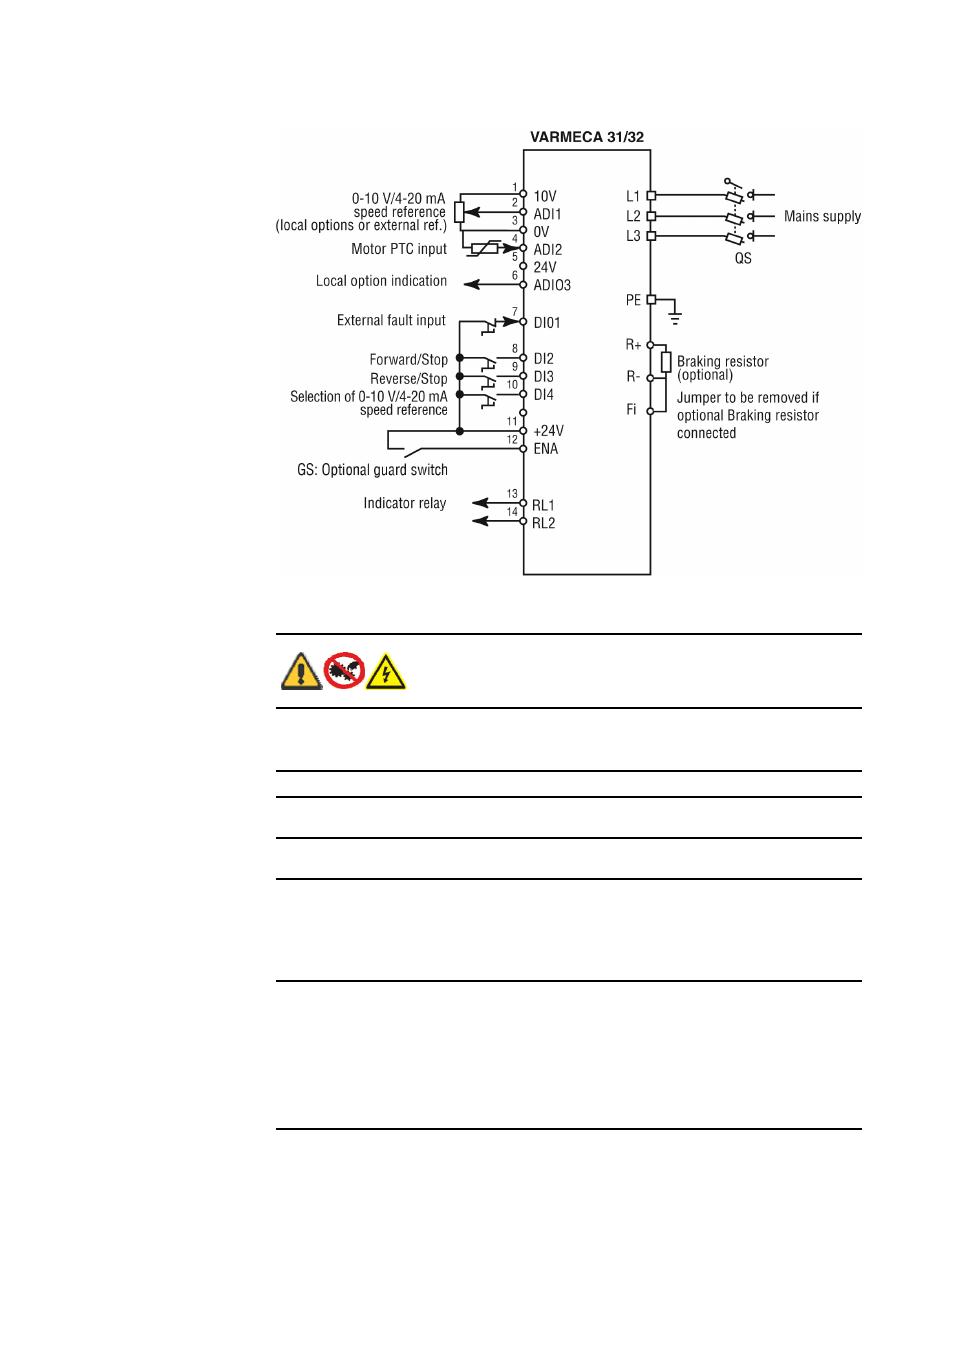 hight resolution of 5 varmeca drives three phase connection diagram 6 varmeca drives keypad indicator light display watson marlow 621cc user manual